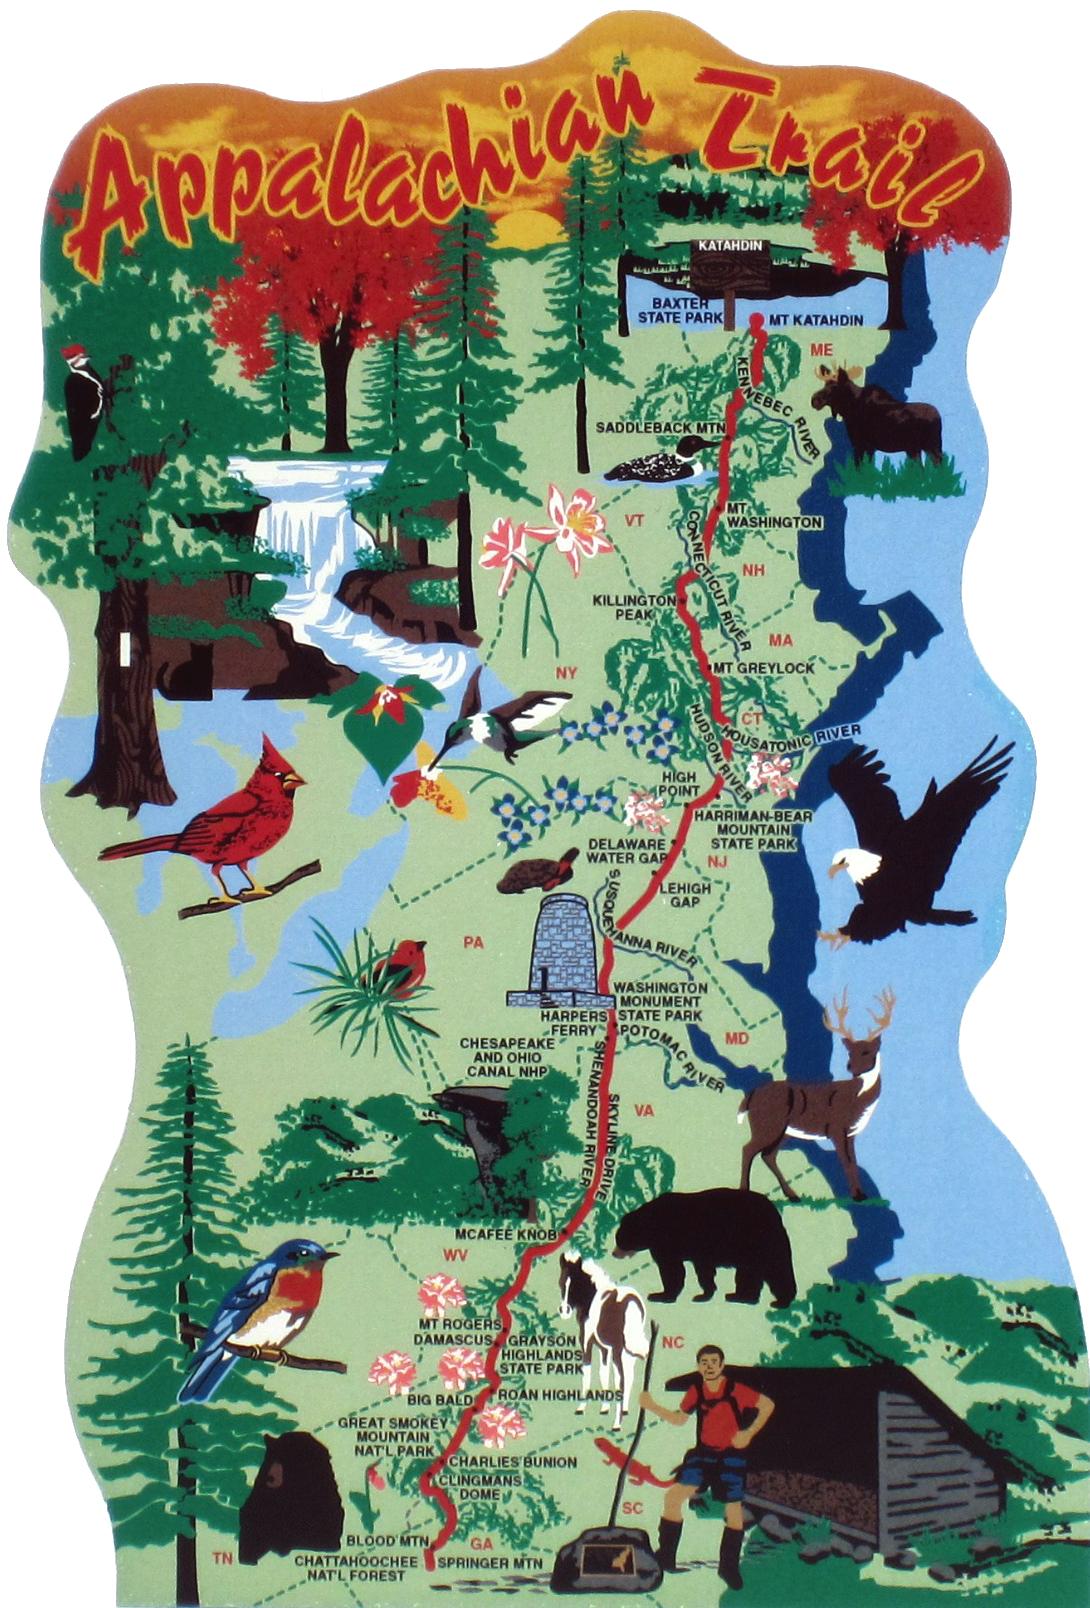 Appalachian Trail Map   Appalachians Trail   Appalachian trail ...